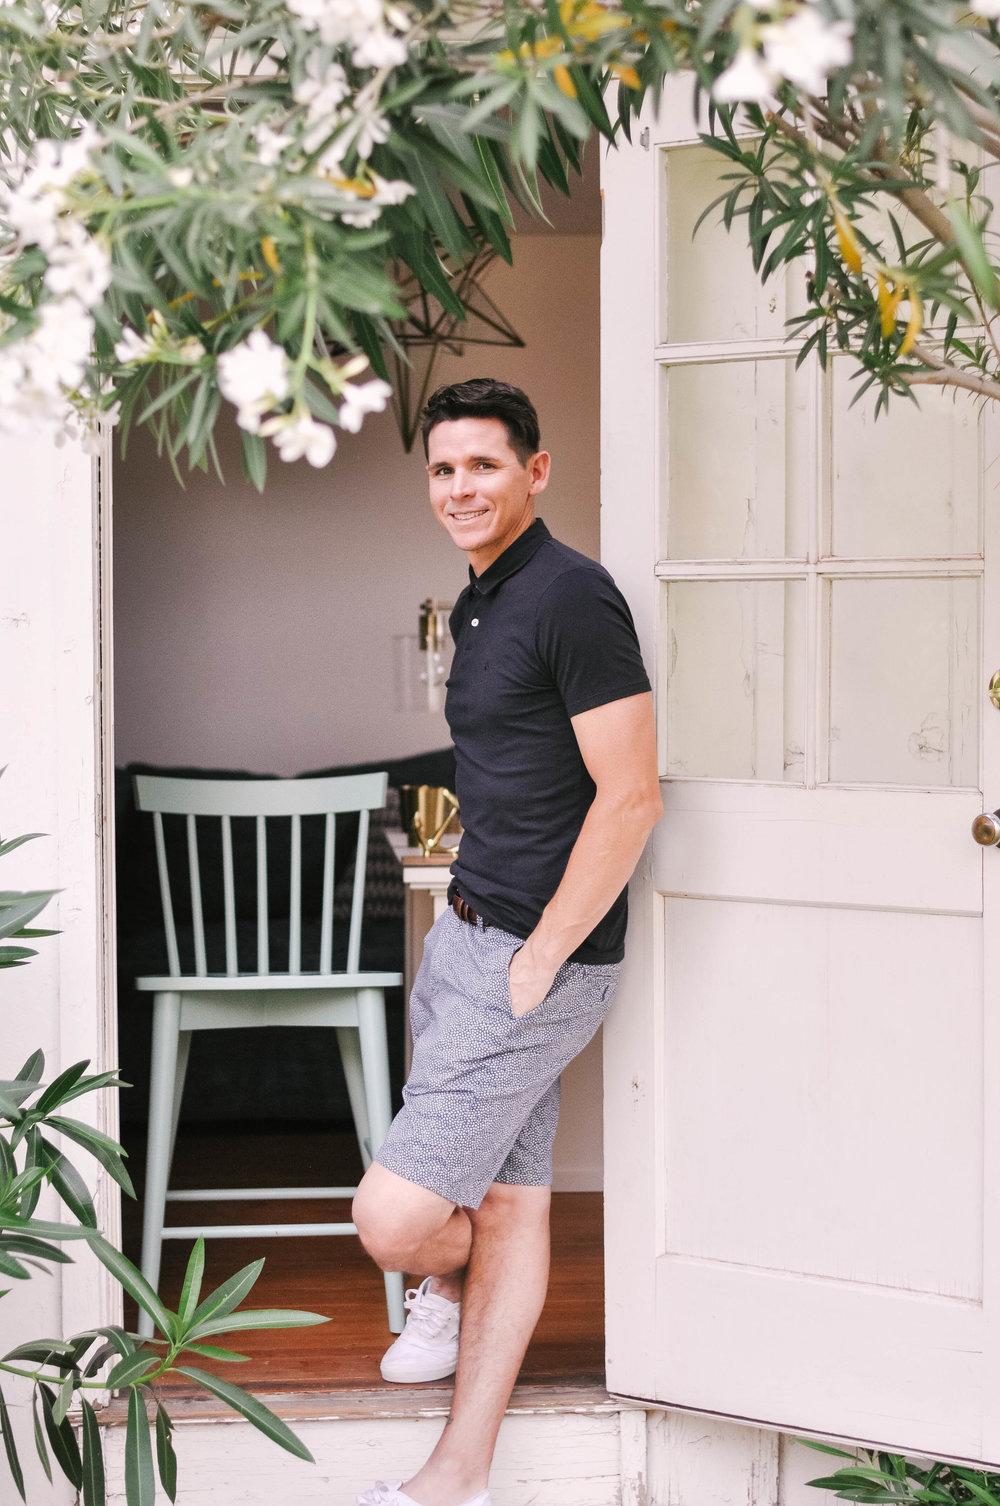 man in shorts posing against door frame